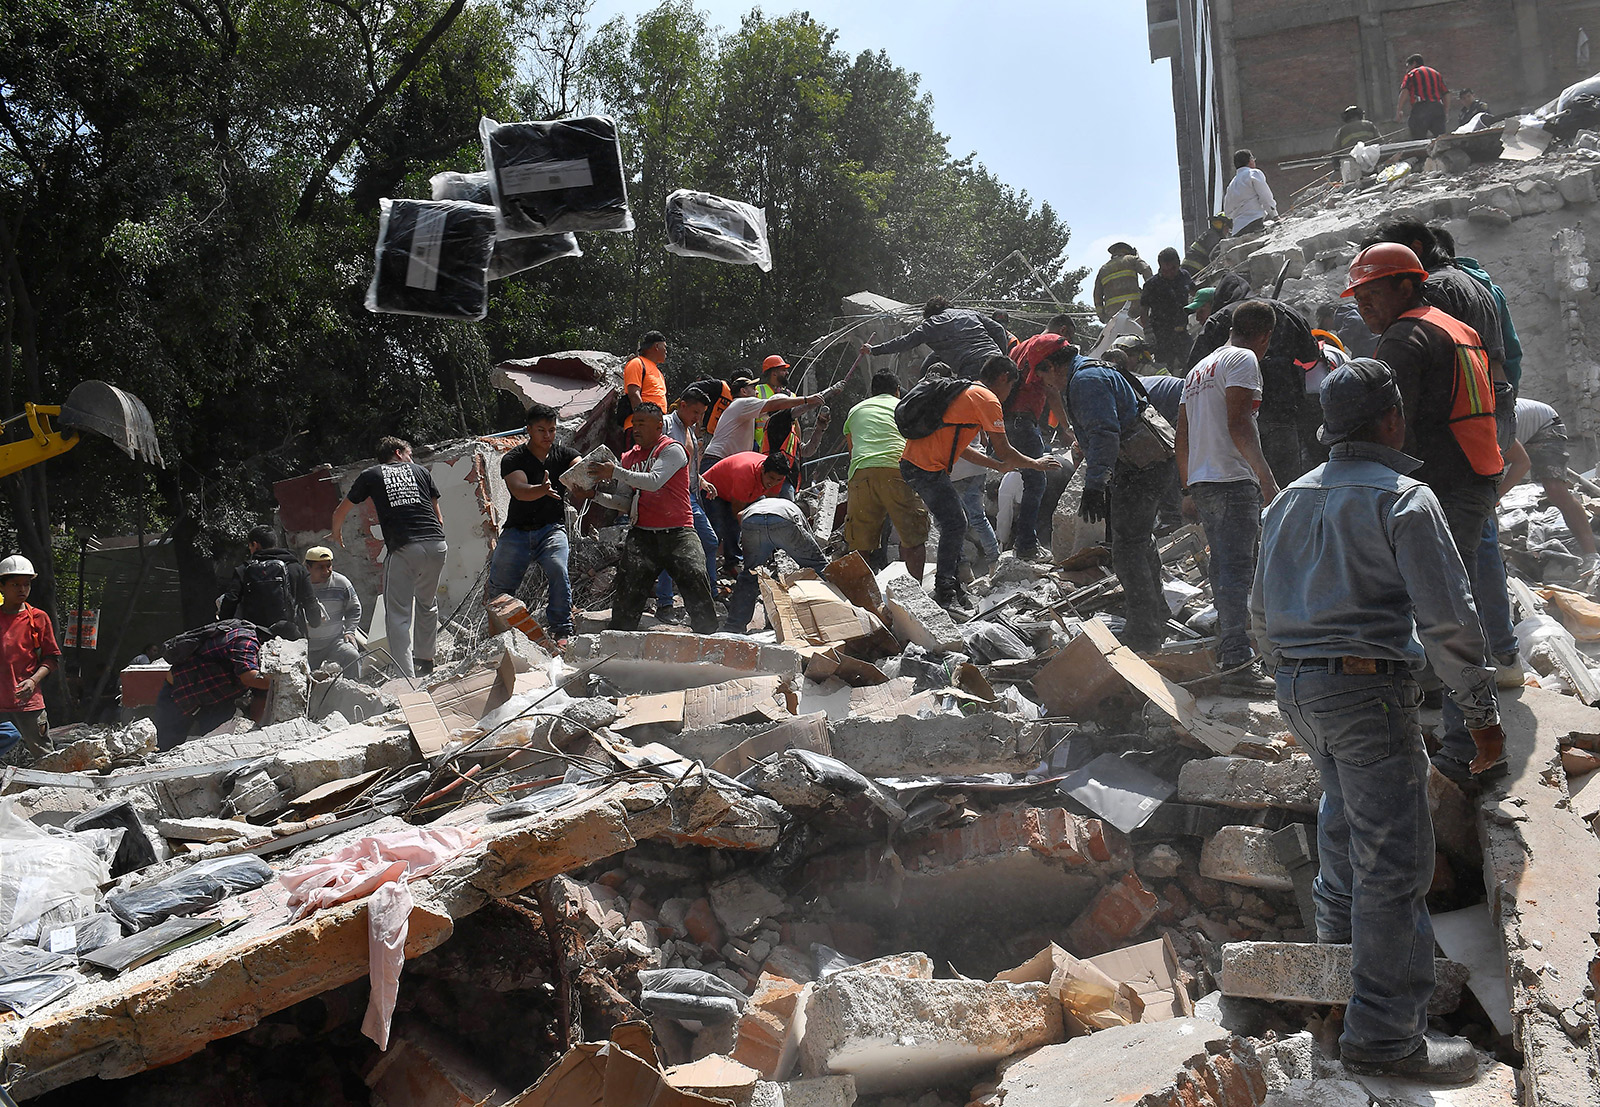 Photos show quake's destruction in Mexico